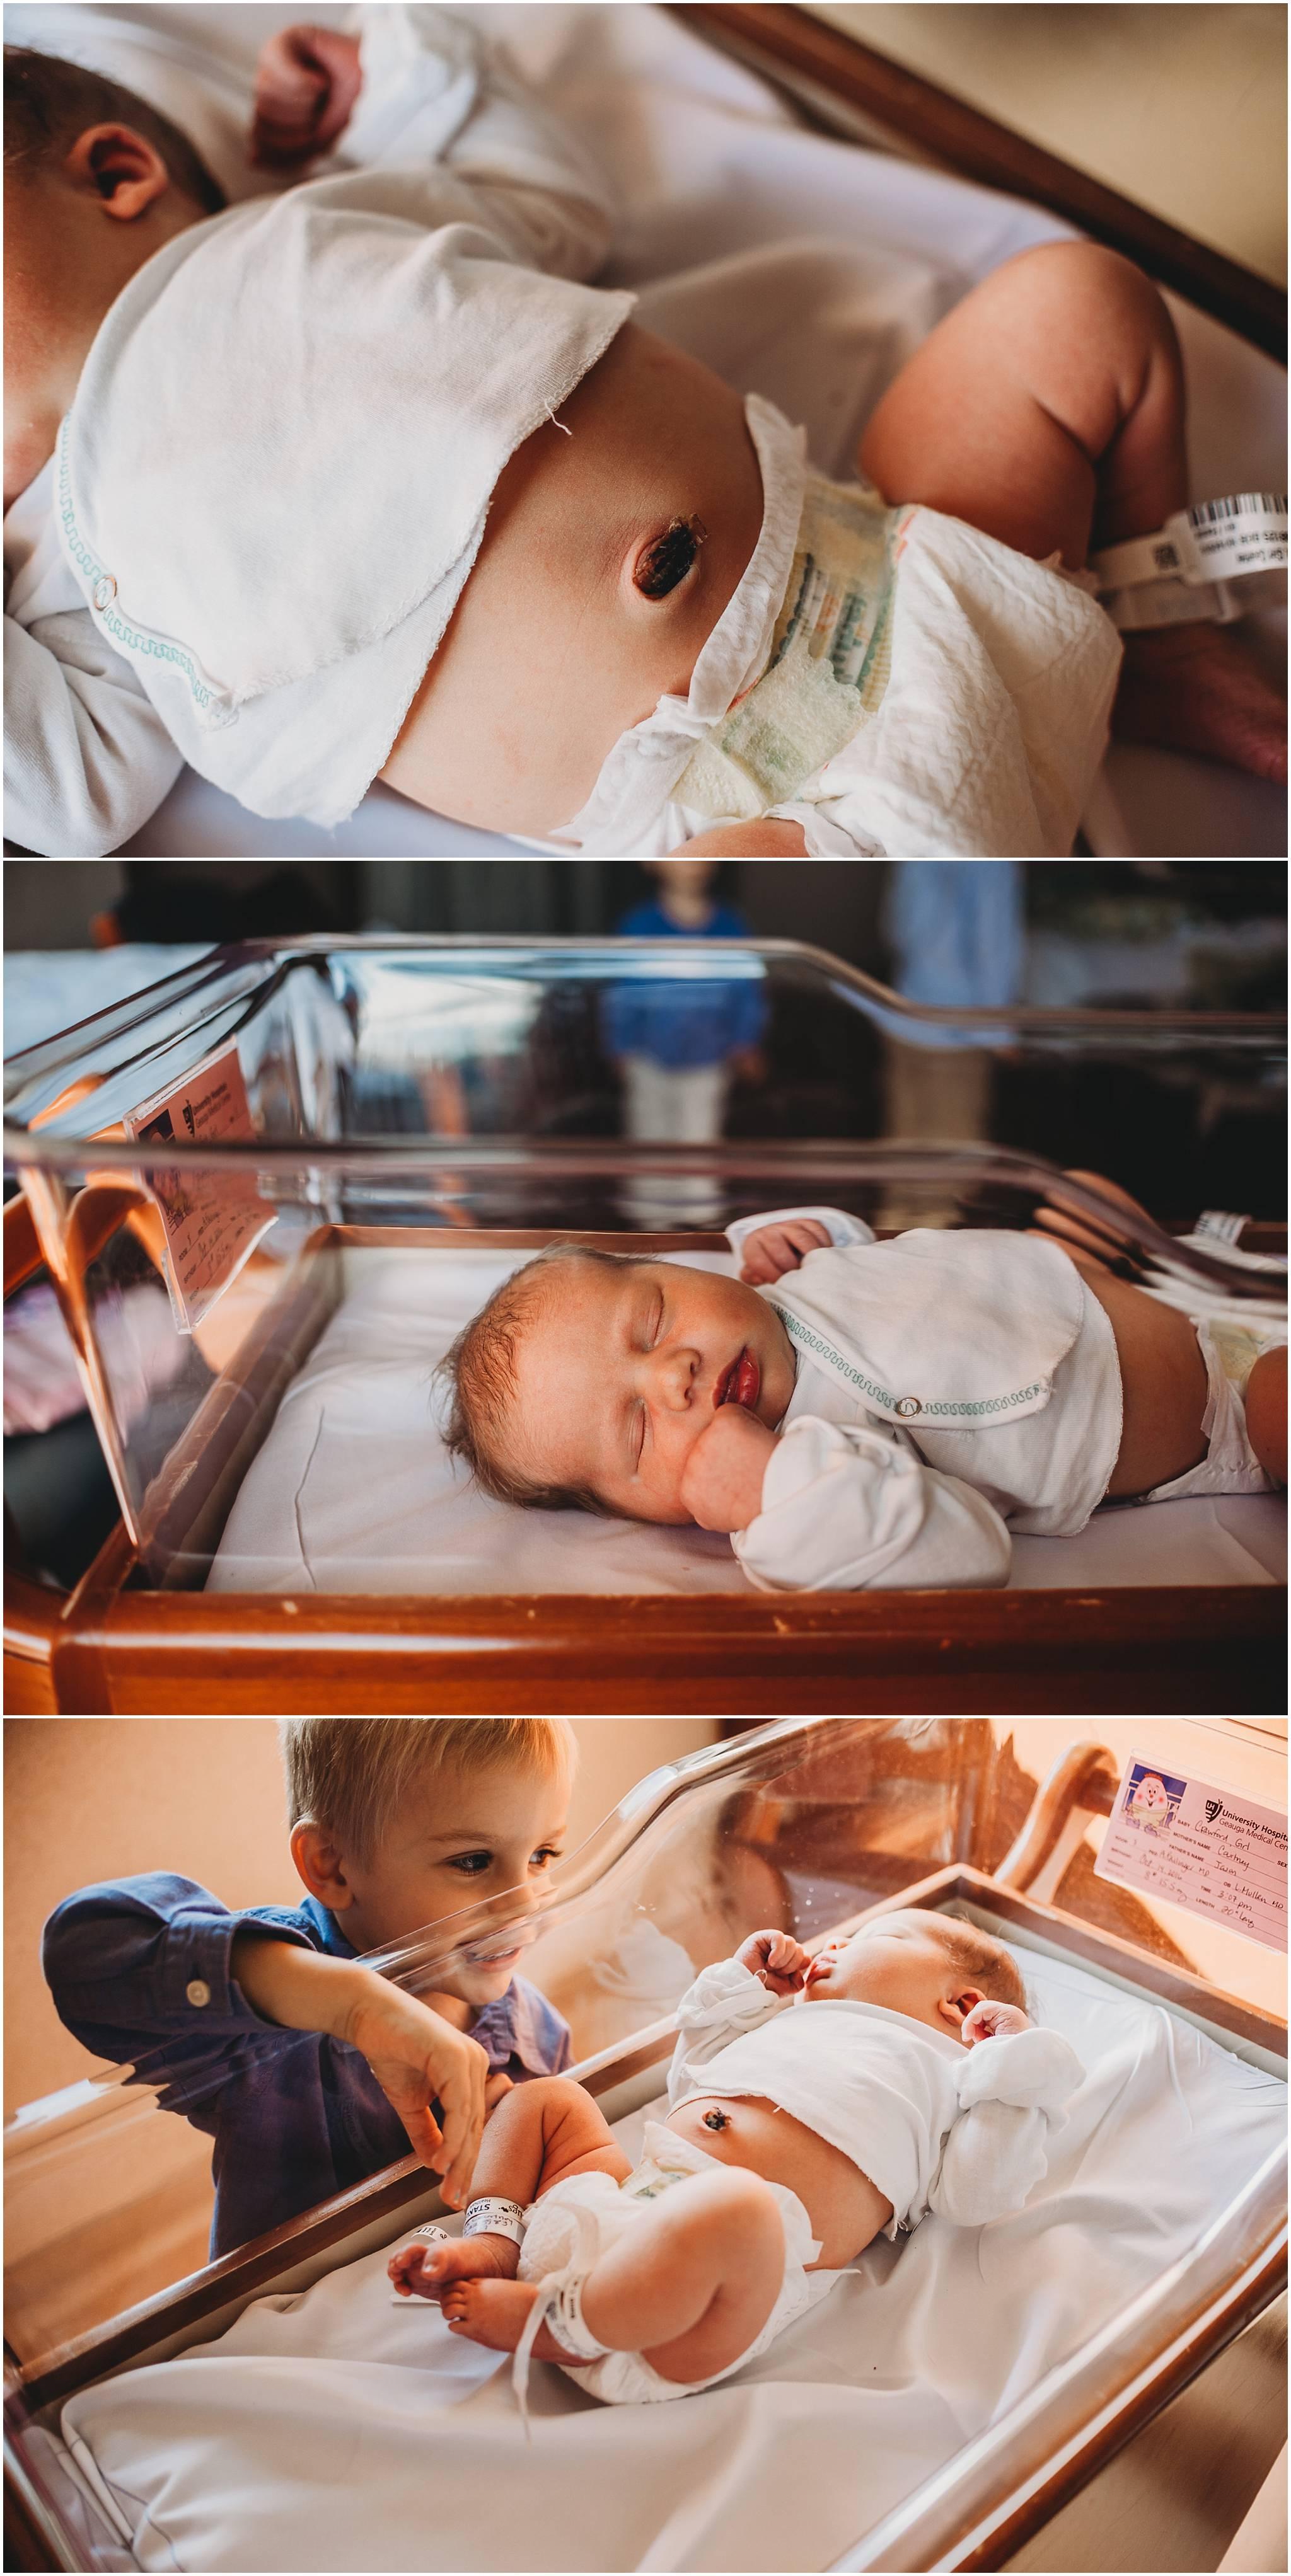 Little baby in Cleveland hospital bassinet